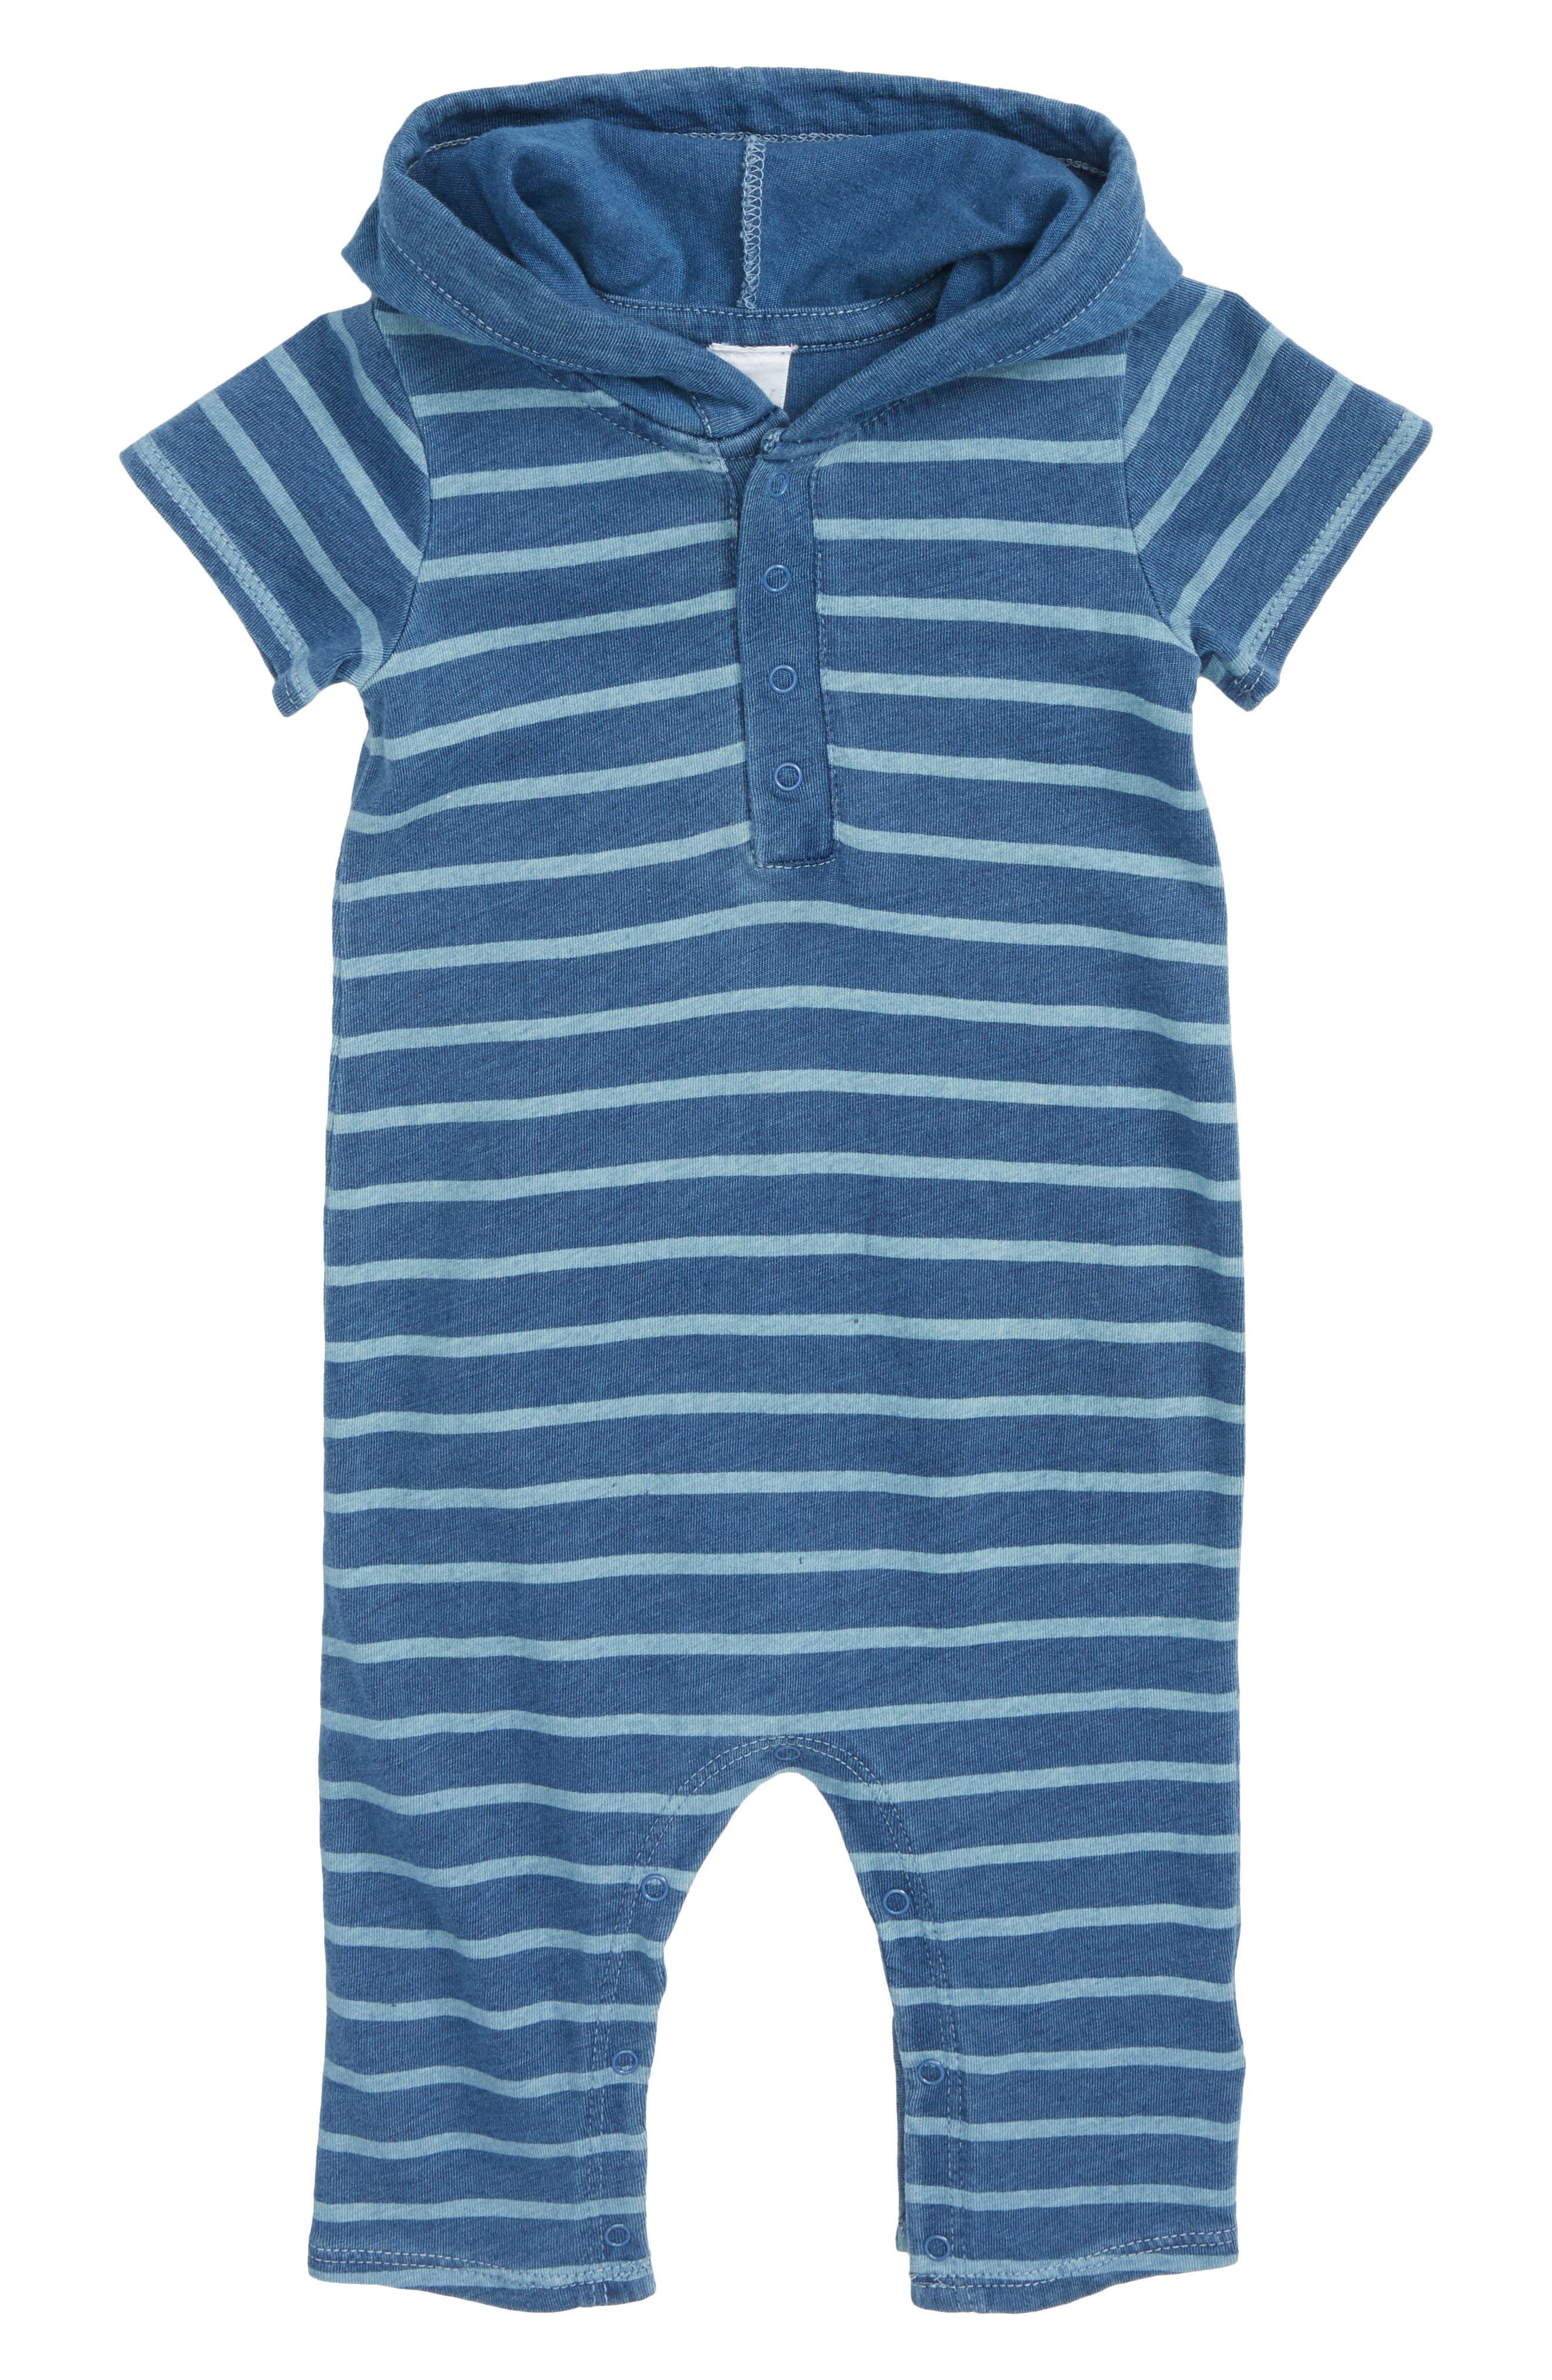 Nordstrom Baby Hooded Romper (Baby Boys)